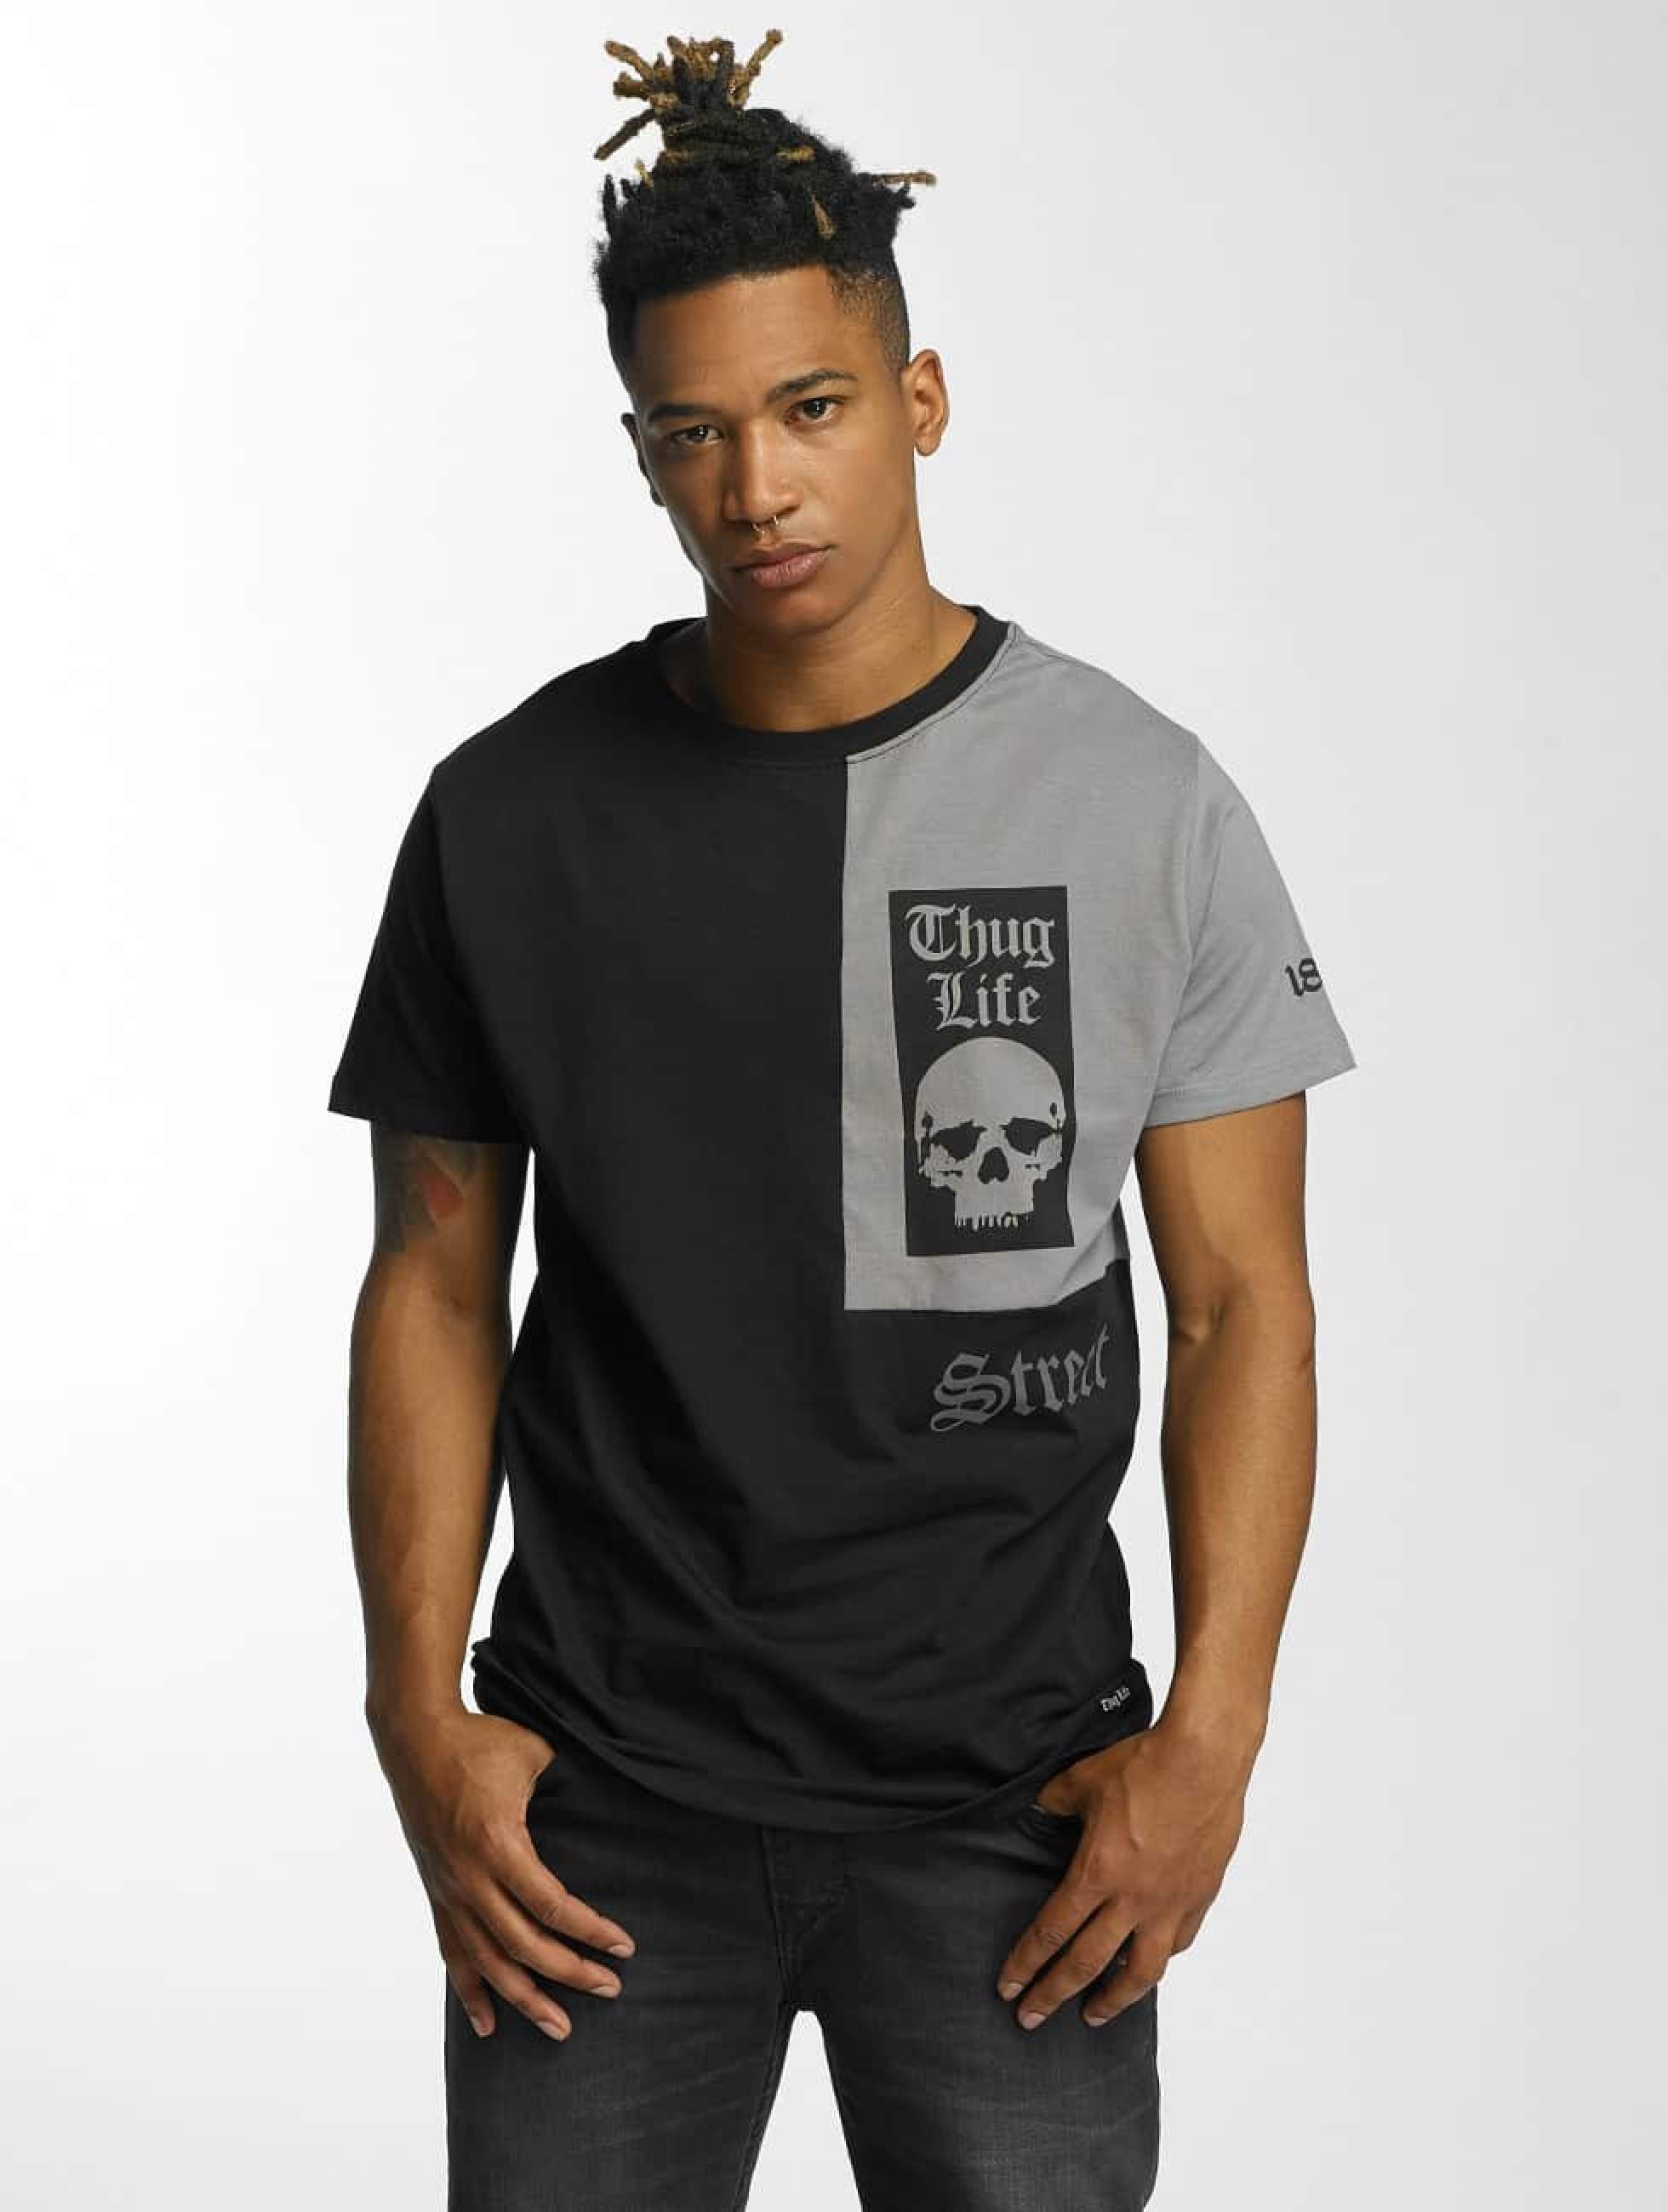 Thug Life / T-Shirt Qube in black S